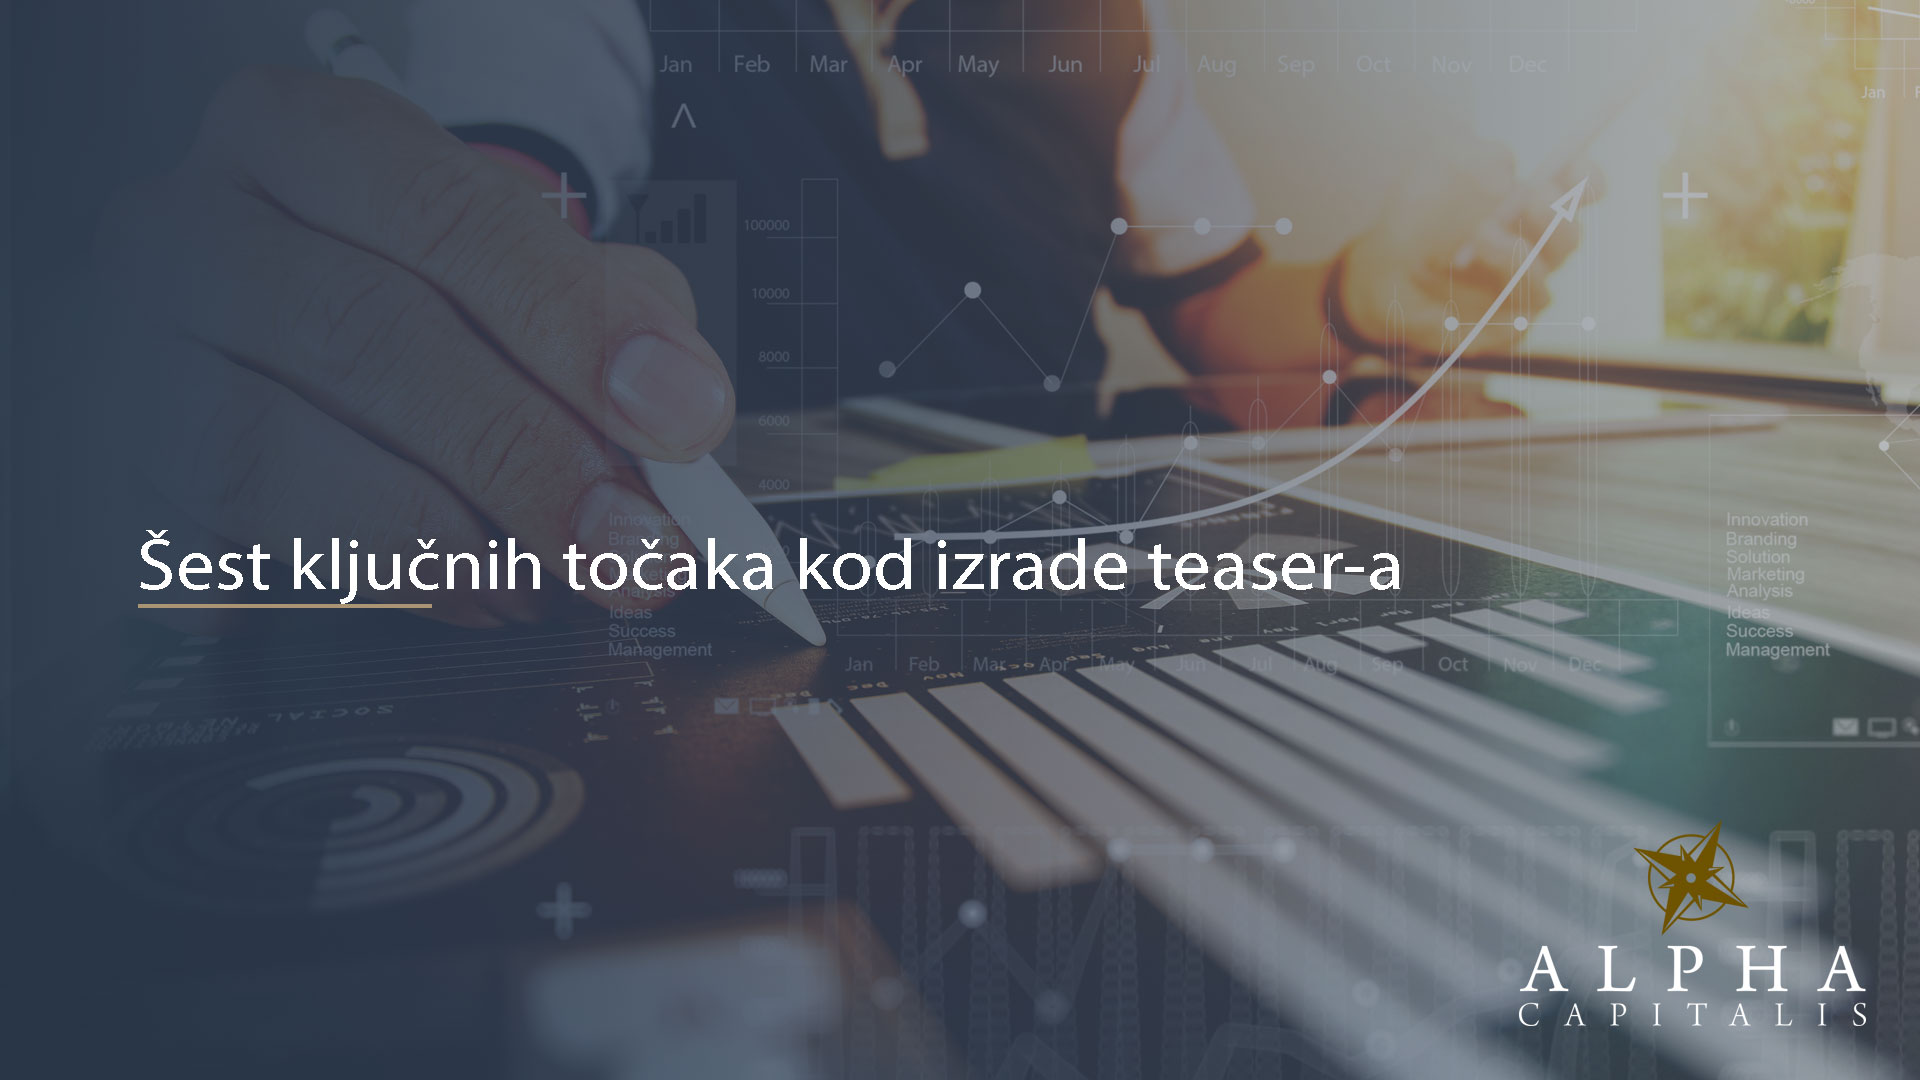 alpha-capitalis-M&A-izrada-teasera